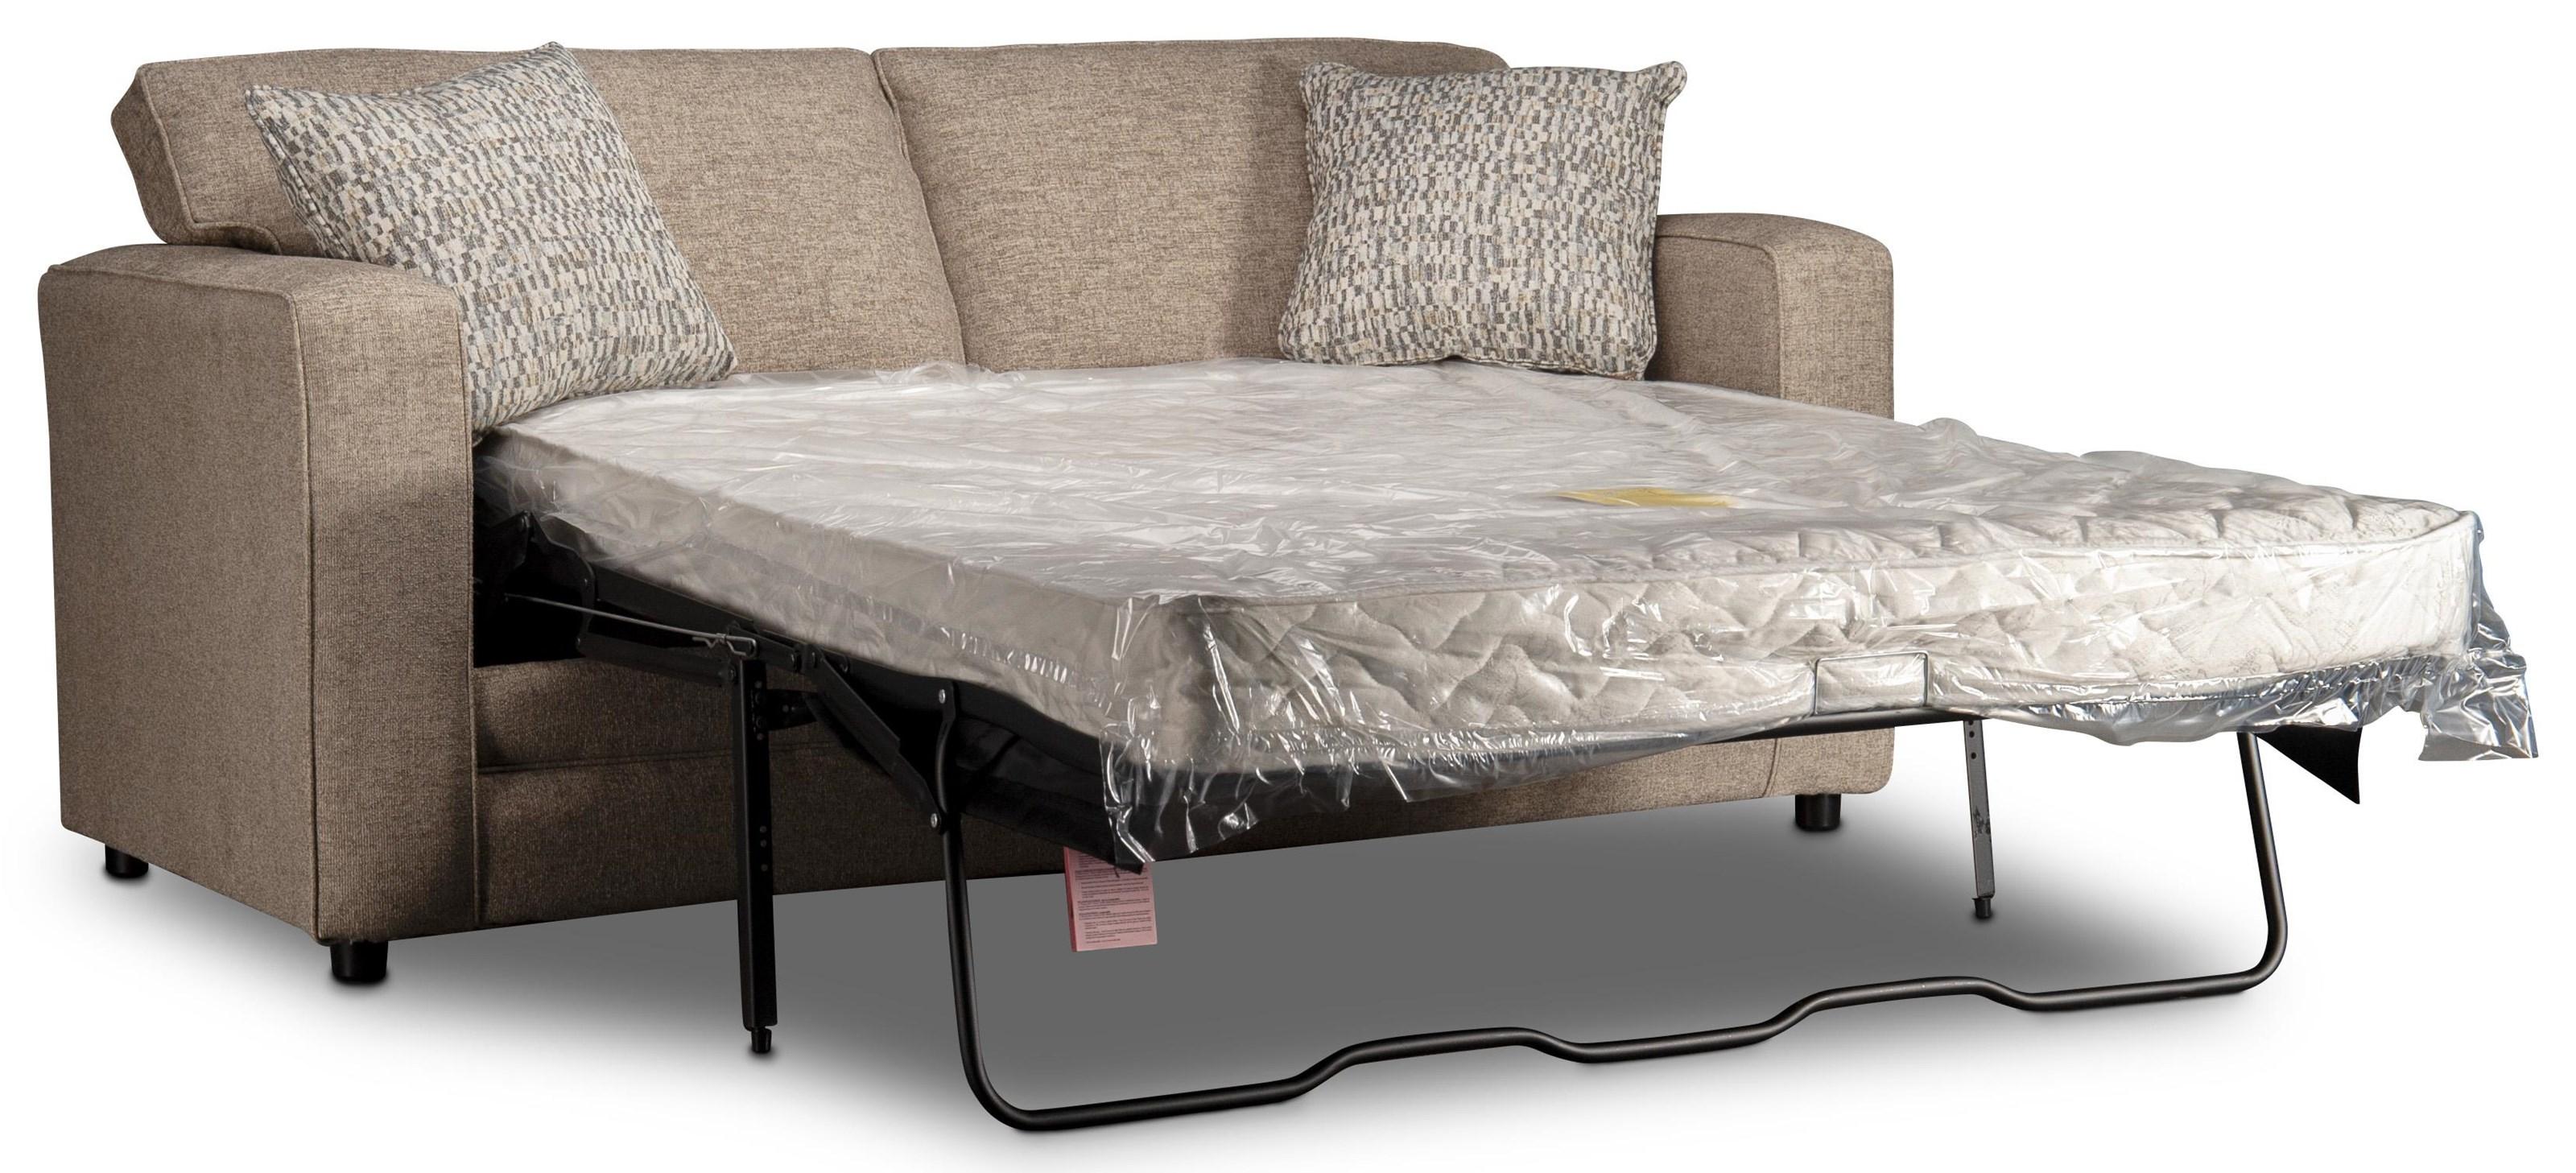 Vera Vera Full Sleeper Sofa by Klaussner at Morris Home